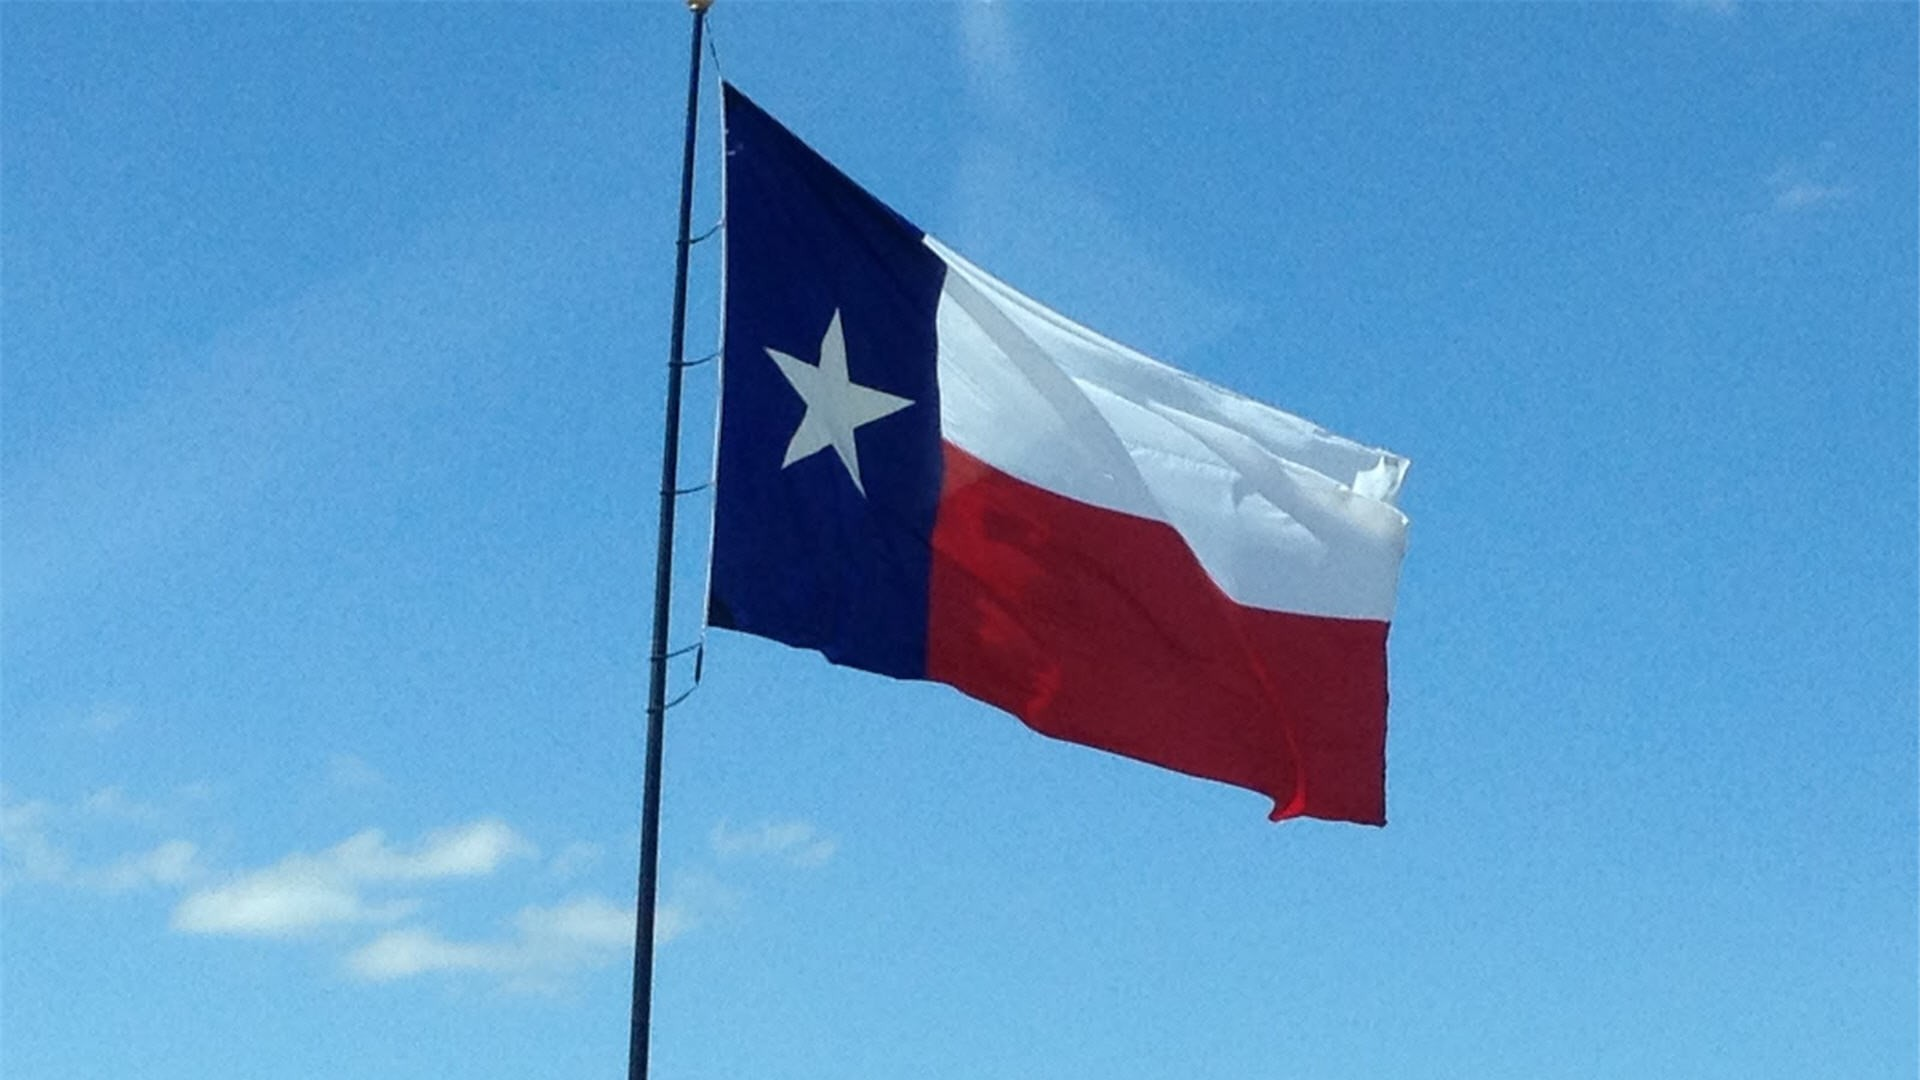 texas flag wallpaper hd